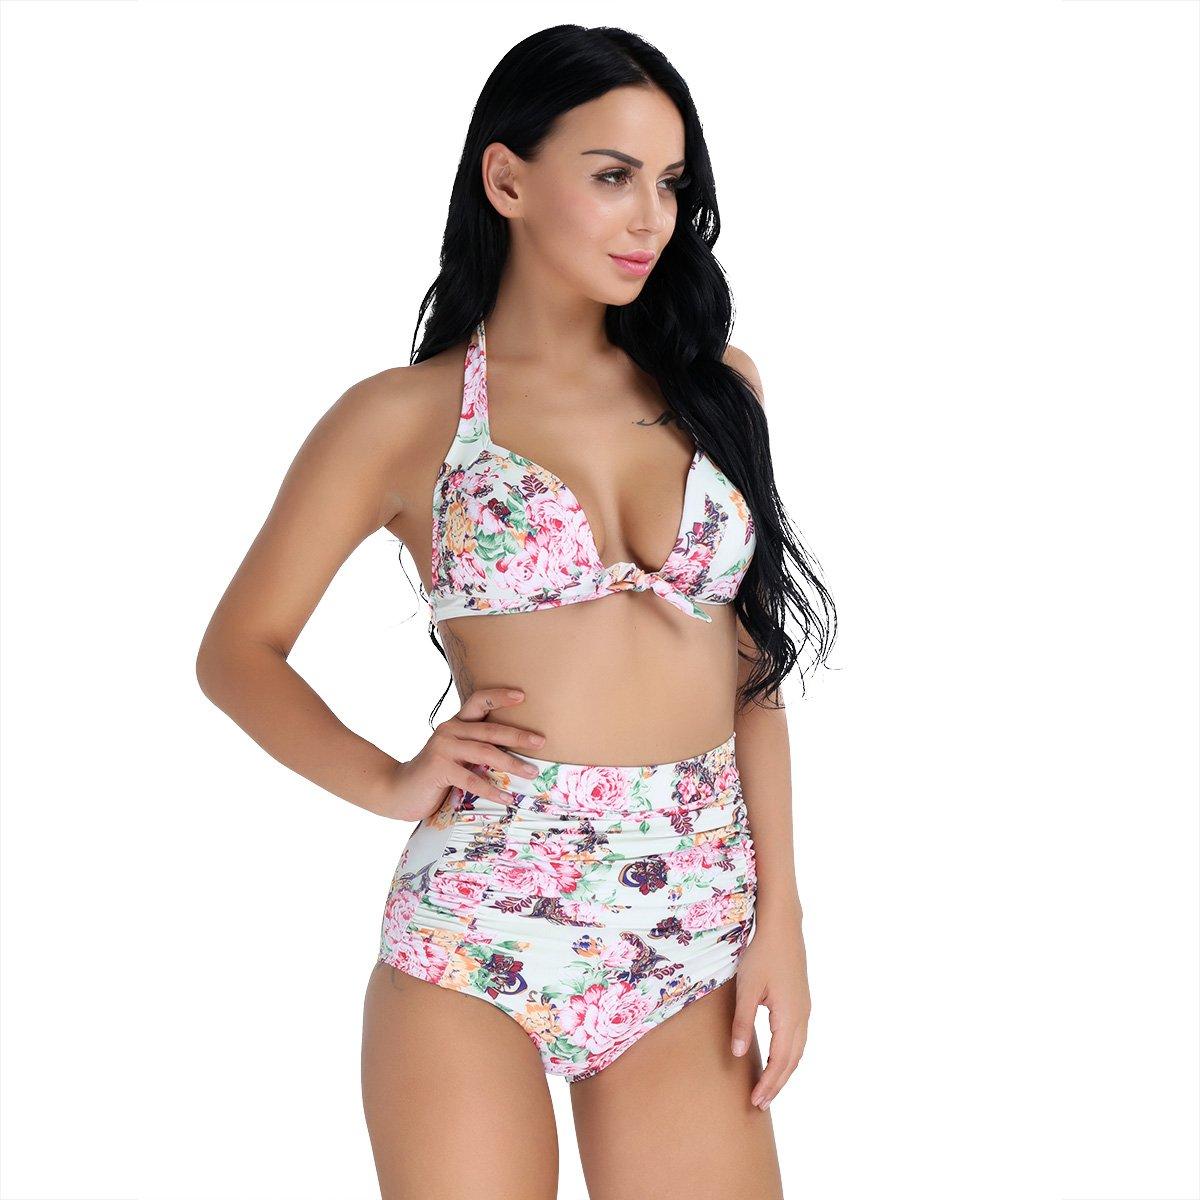 069e141c9d638 Amazon.com  YiZYiF Women s High Waist Floral Printed Padded Swimwear Plus Size  Bikini 2PCS Set Light Green Small  Clothing